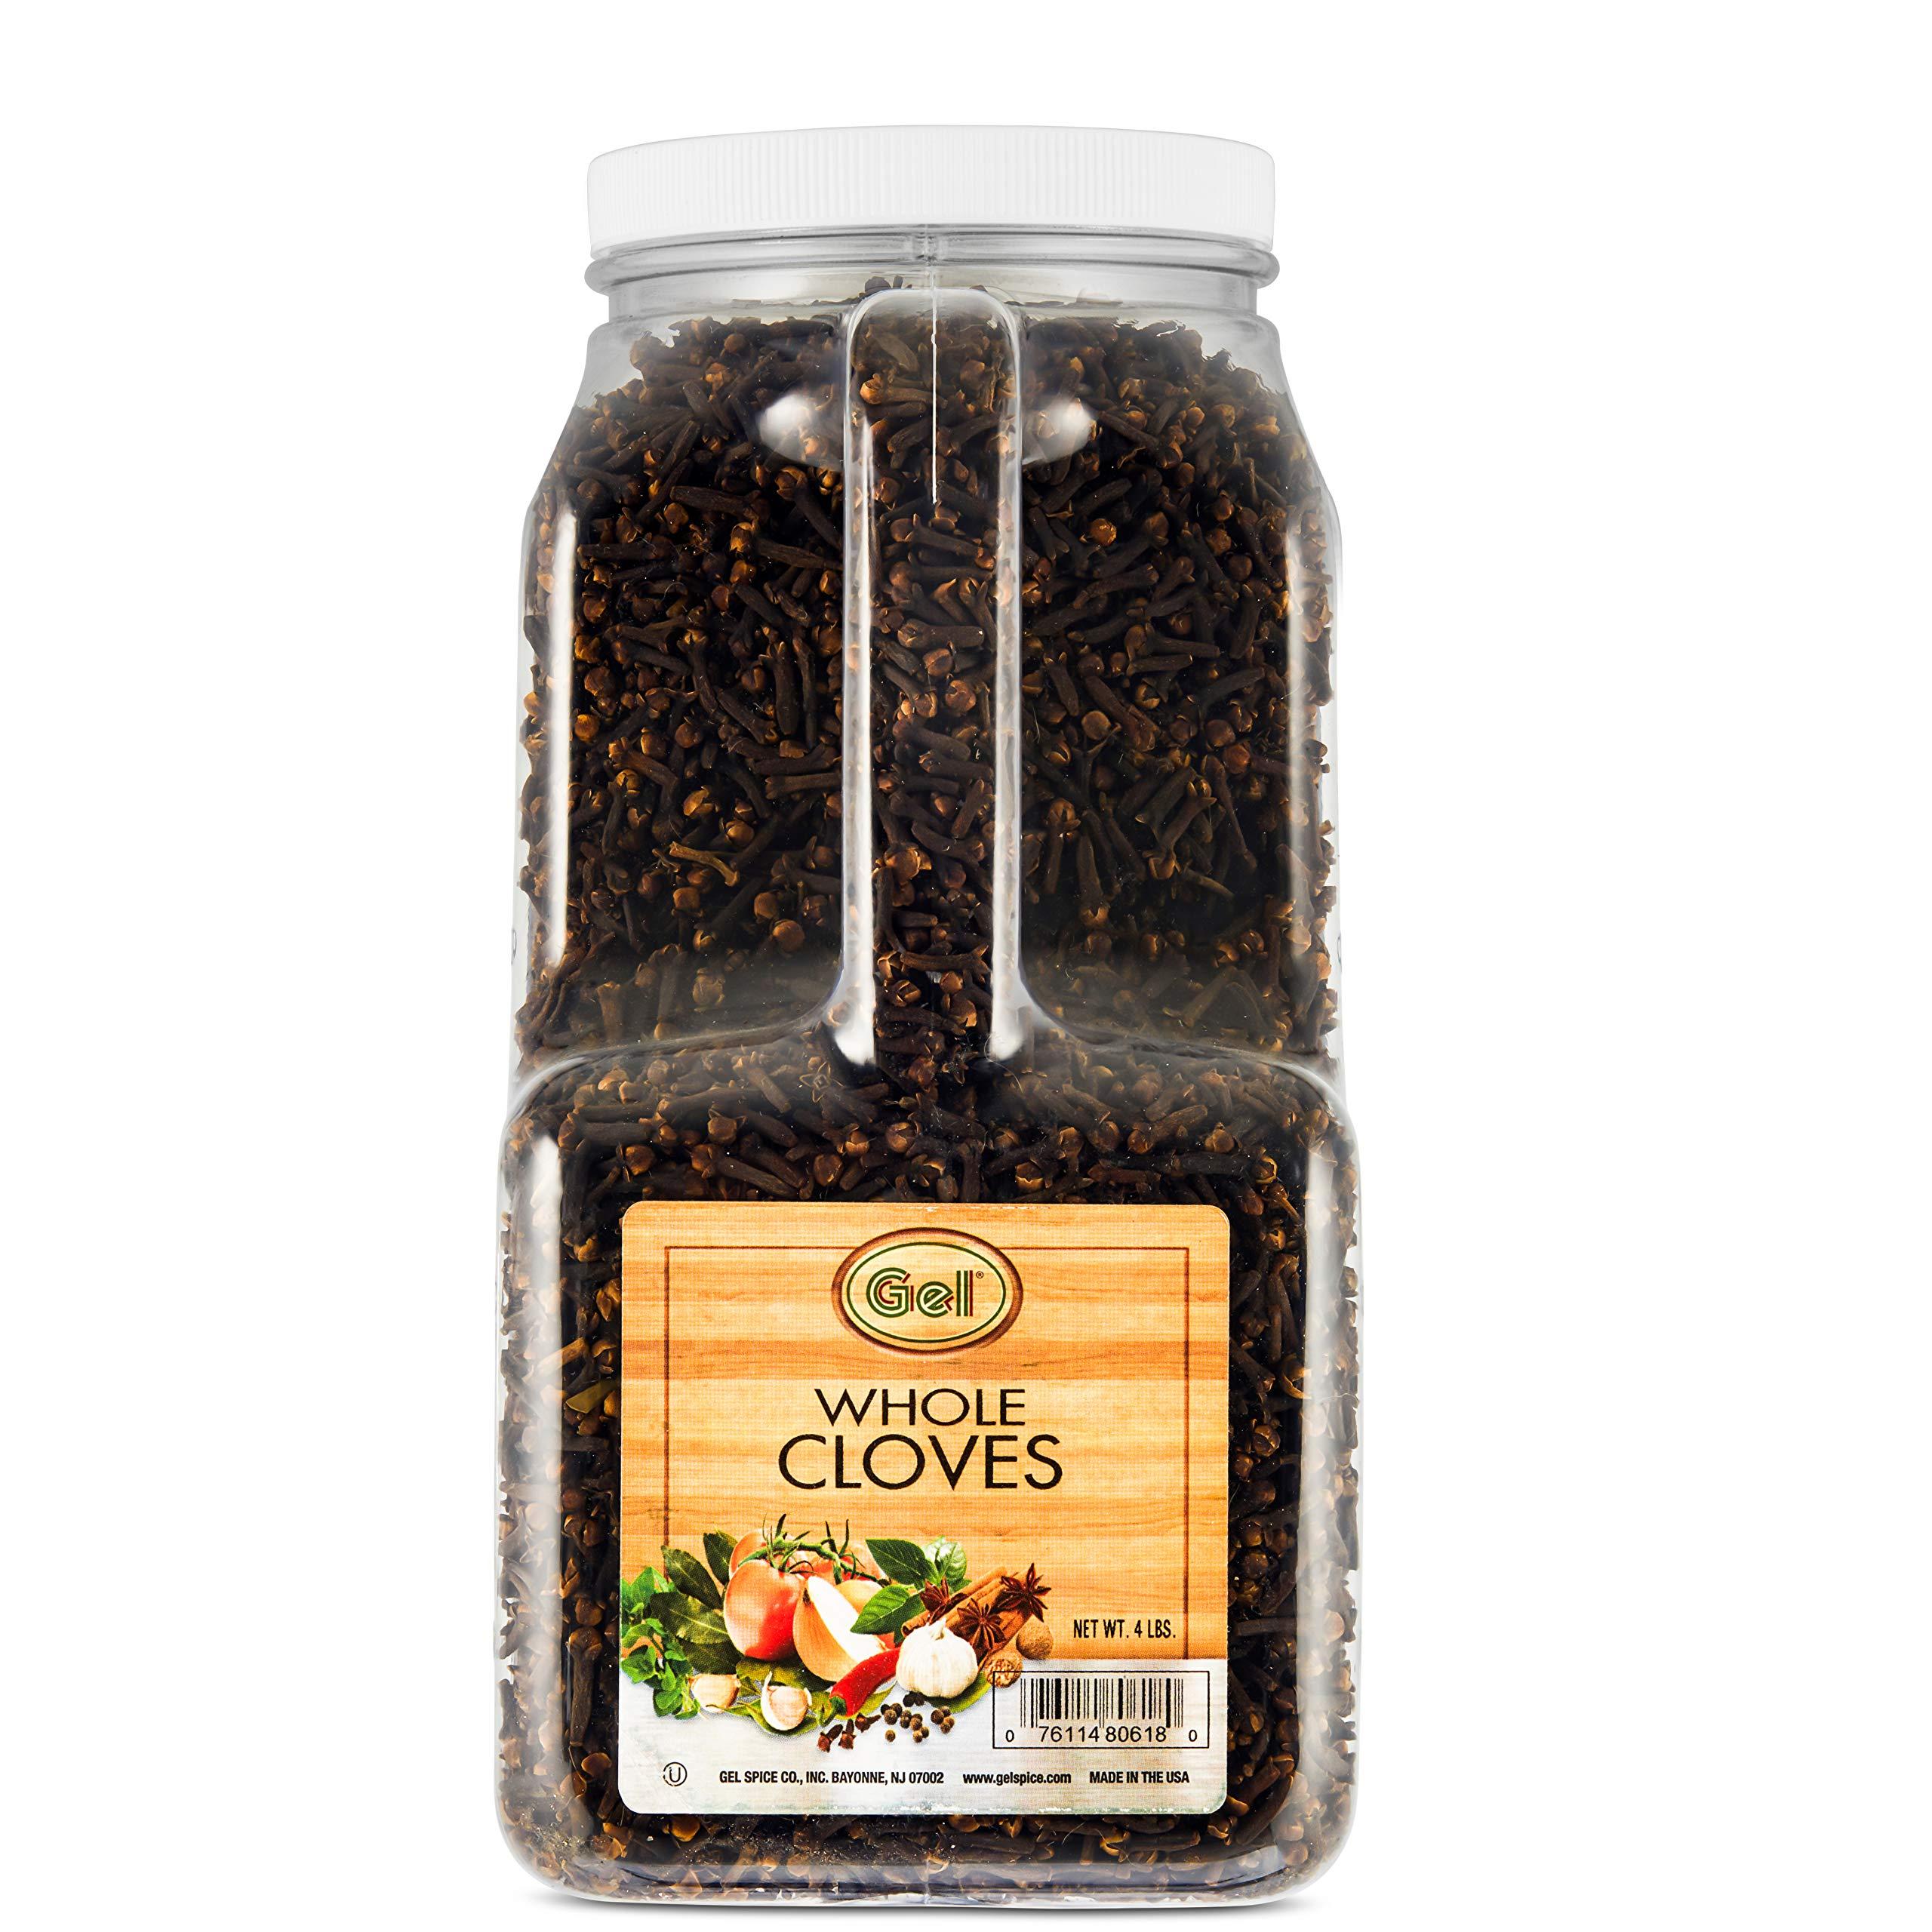 Gel Spice Whole Cloves Food Service Size -4 lb